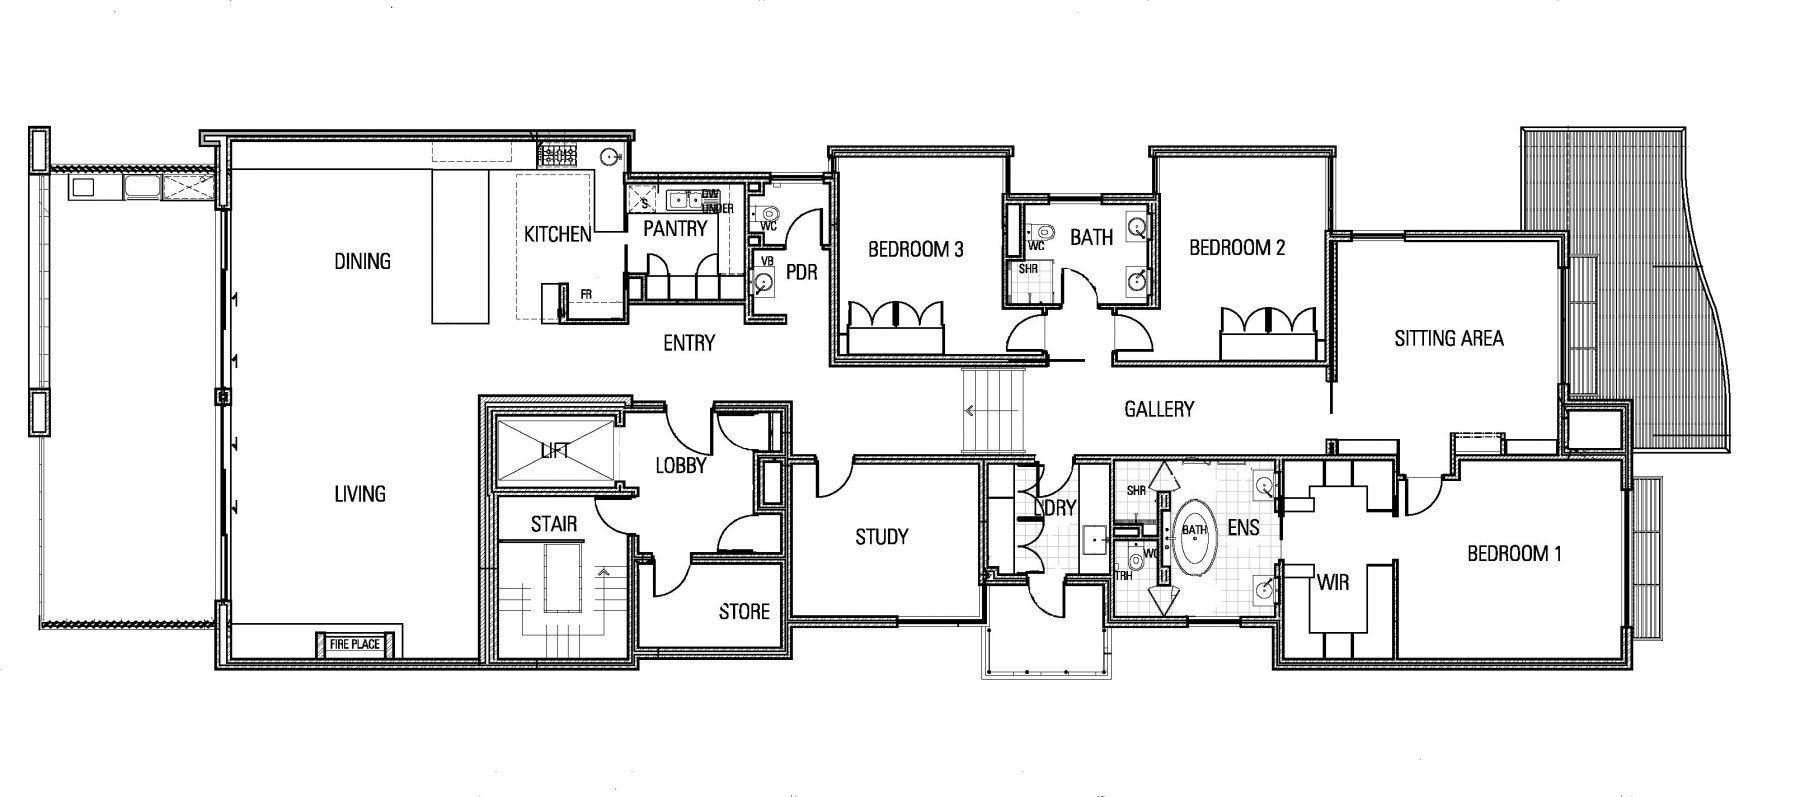 Property floorplan image